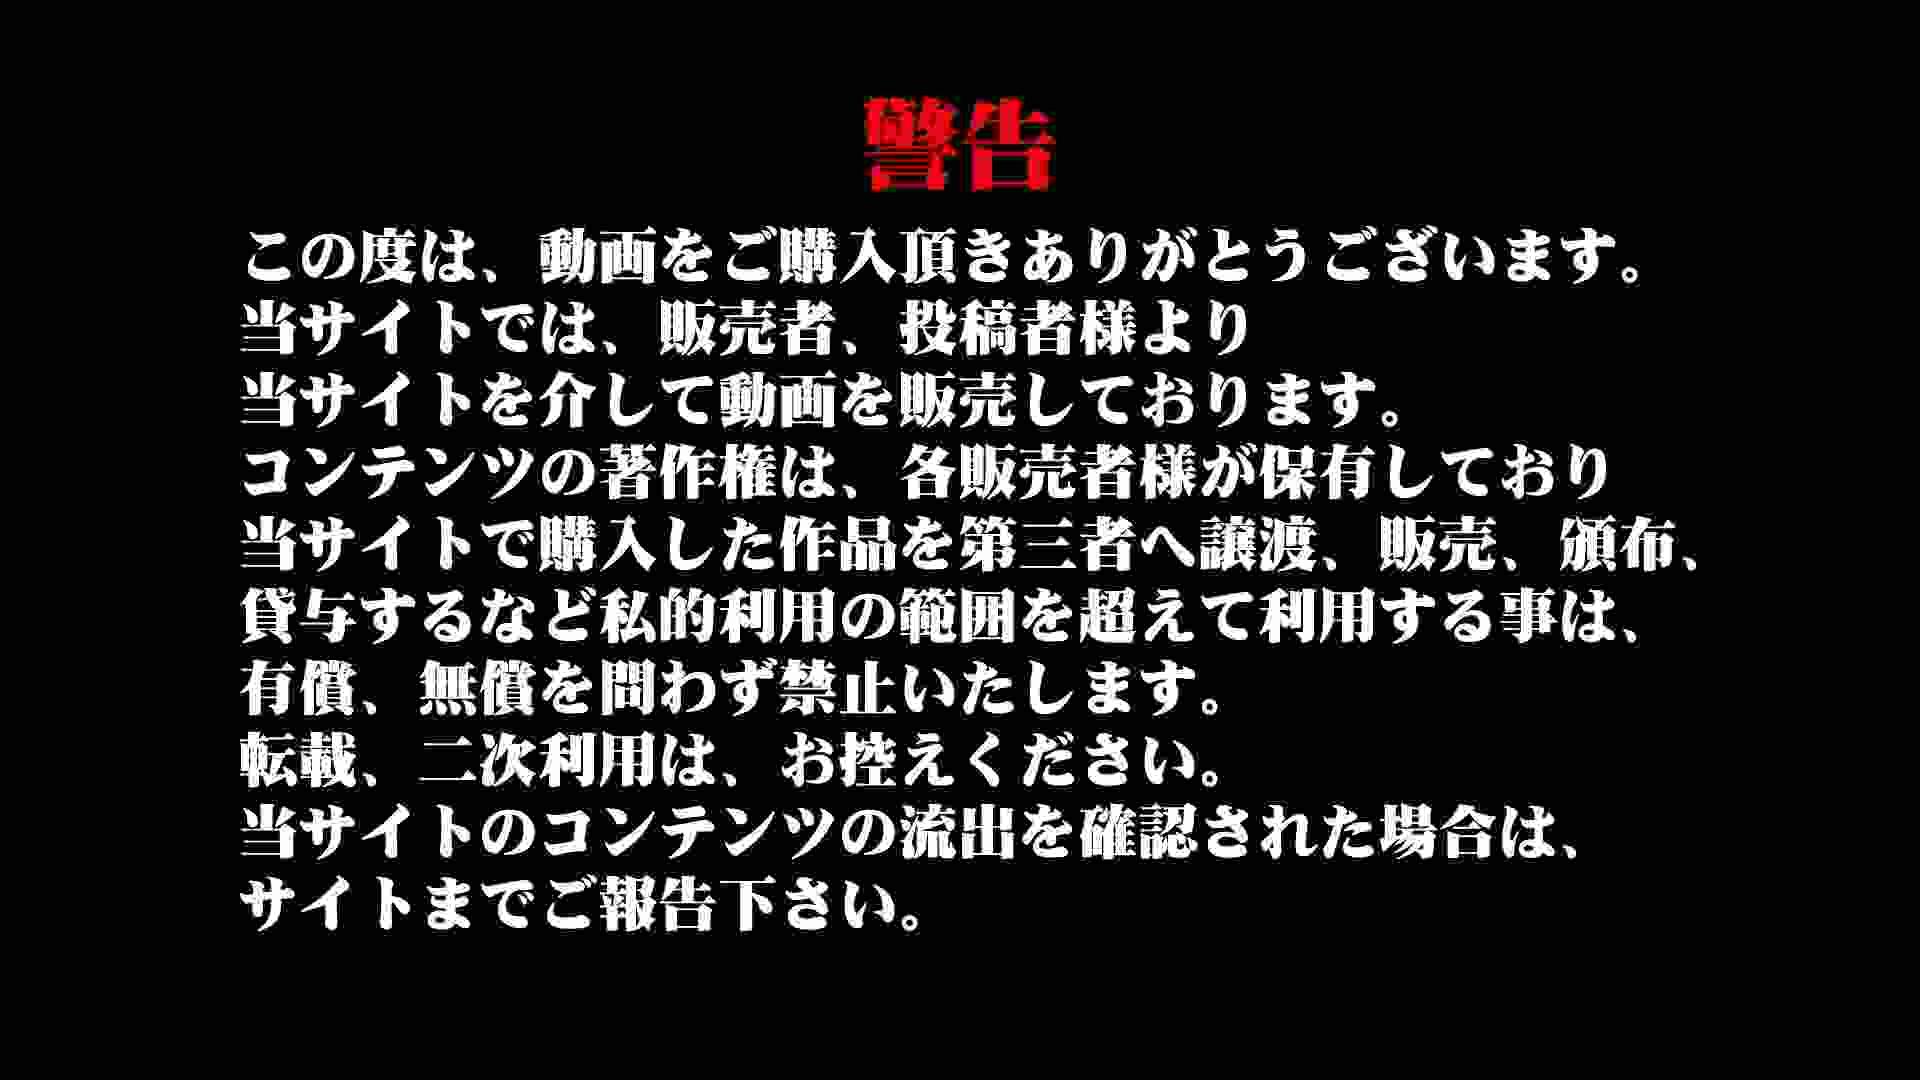 Aquaな露天風呂Vol.919 OLのエロ生活   露天風呂  91連発 4